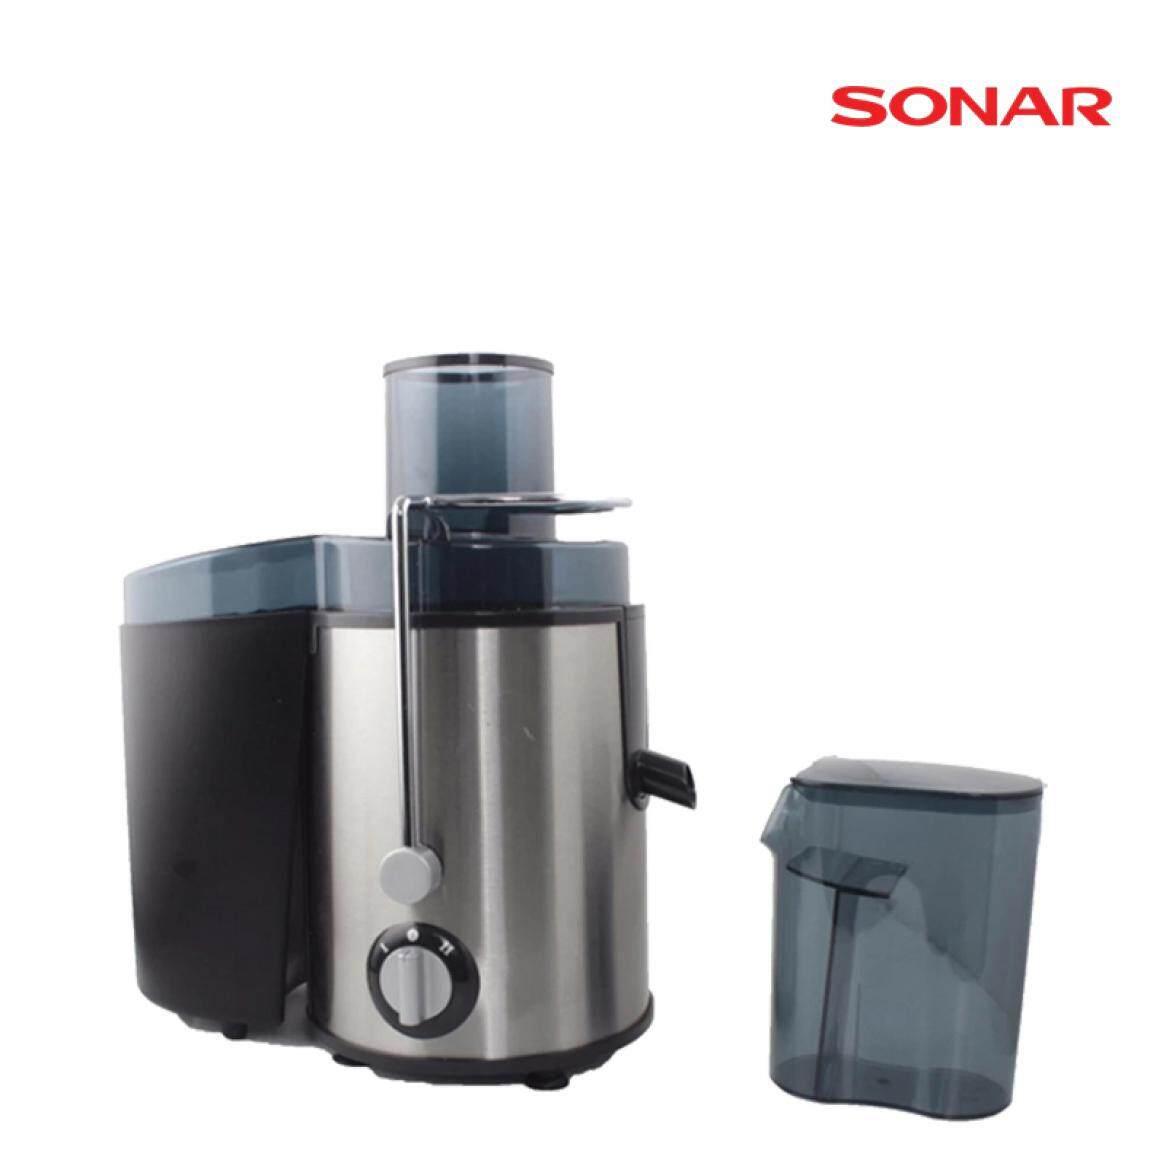 SONAR เครื่องปั่นน้ำผลไม้พร้อมดื่ม รุ่น JC-617S Juice Blender คุณภาพดี